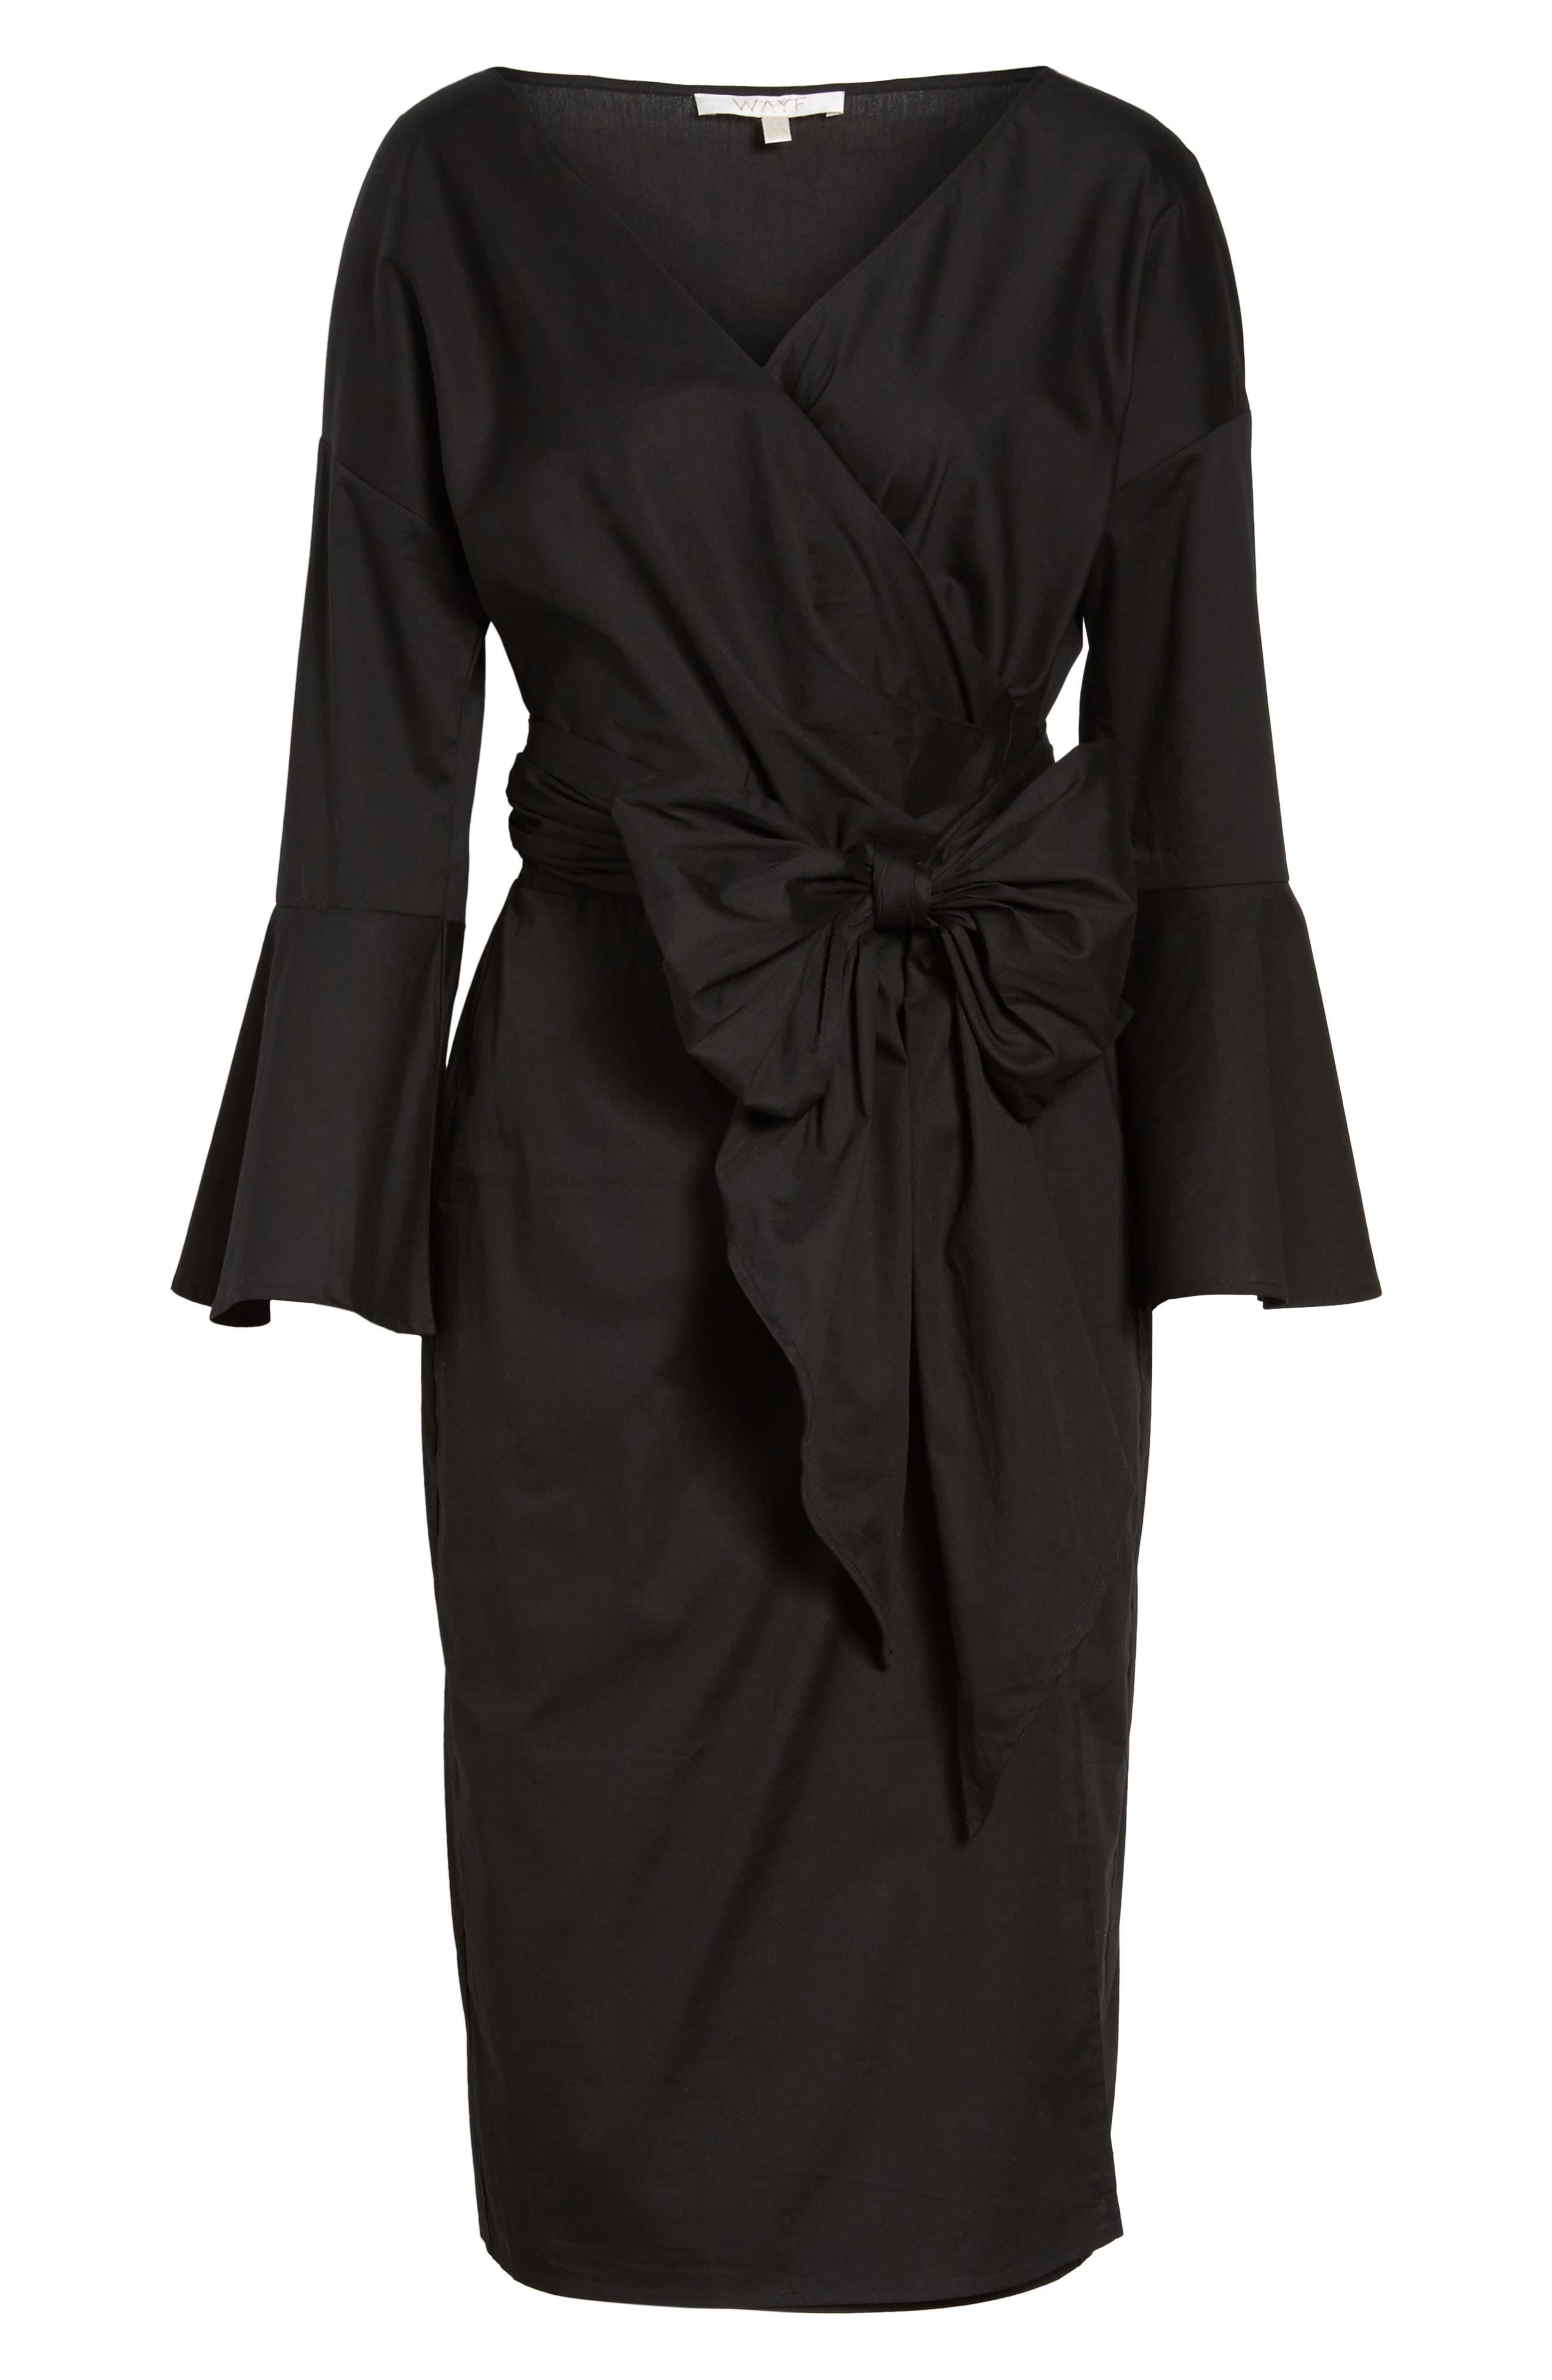 Wrap Bell Sleeve Dress,                             Alternate thumbnail 6, color,                             001